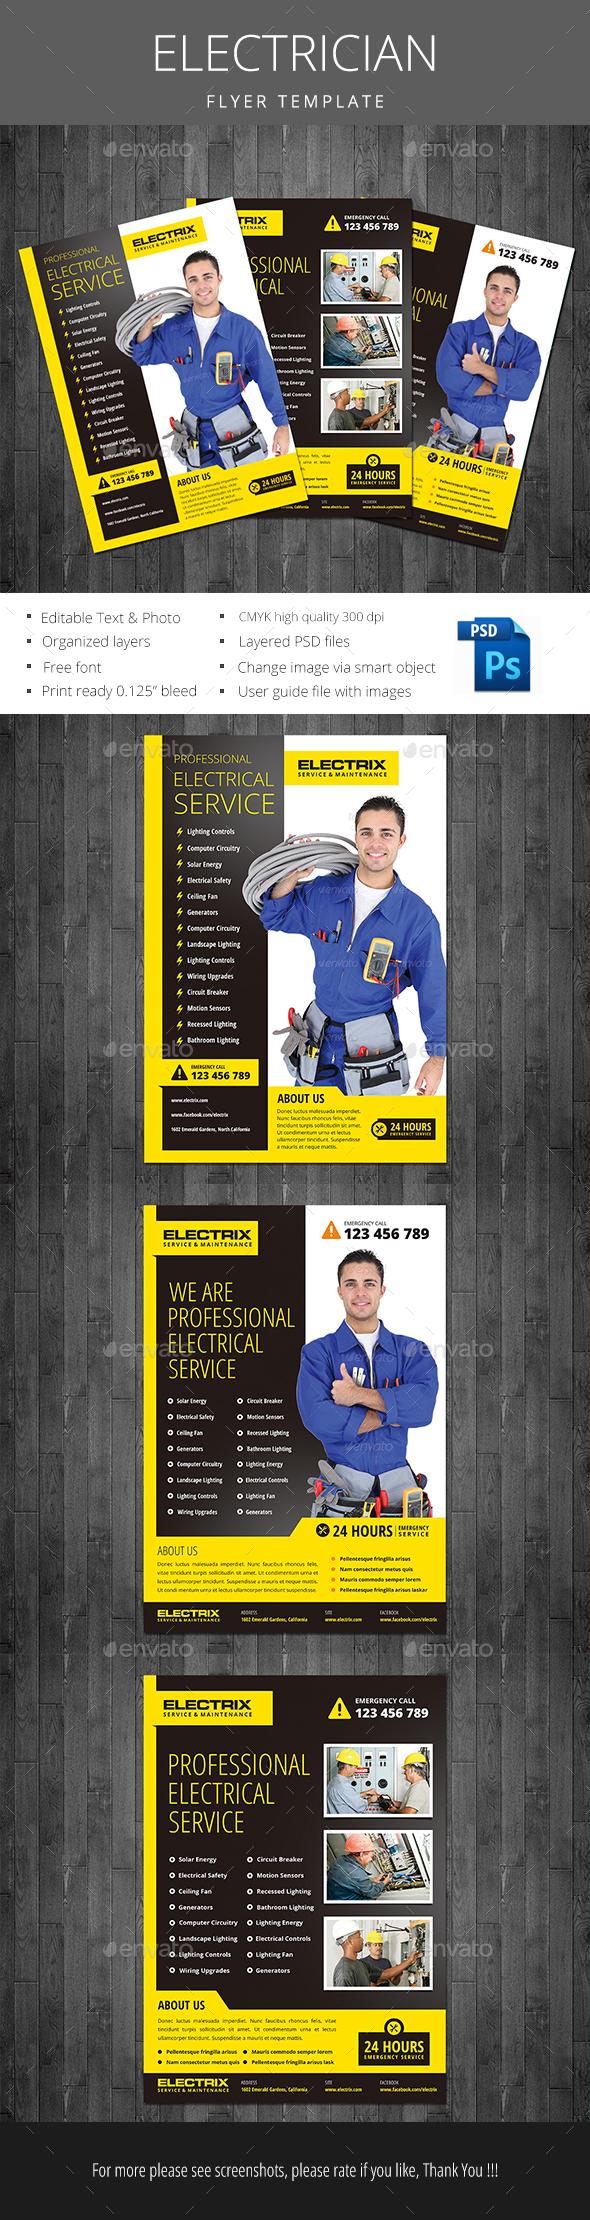 Electrician Flyer - Flyers Print Templates